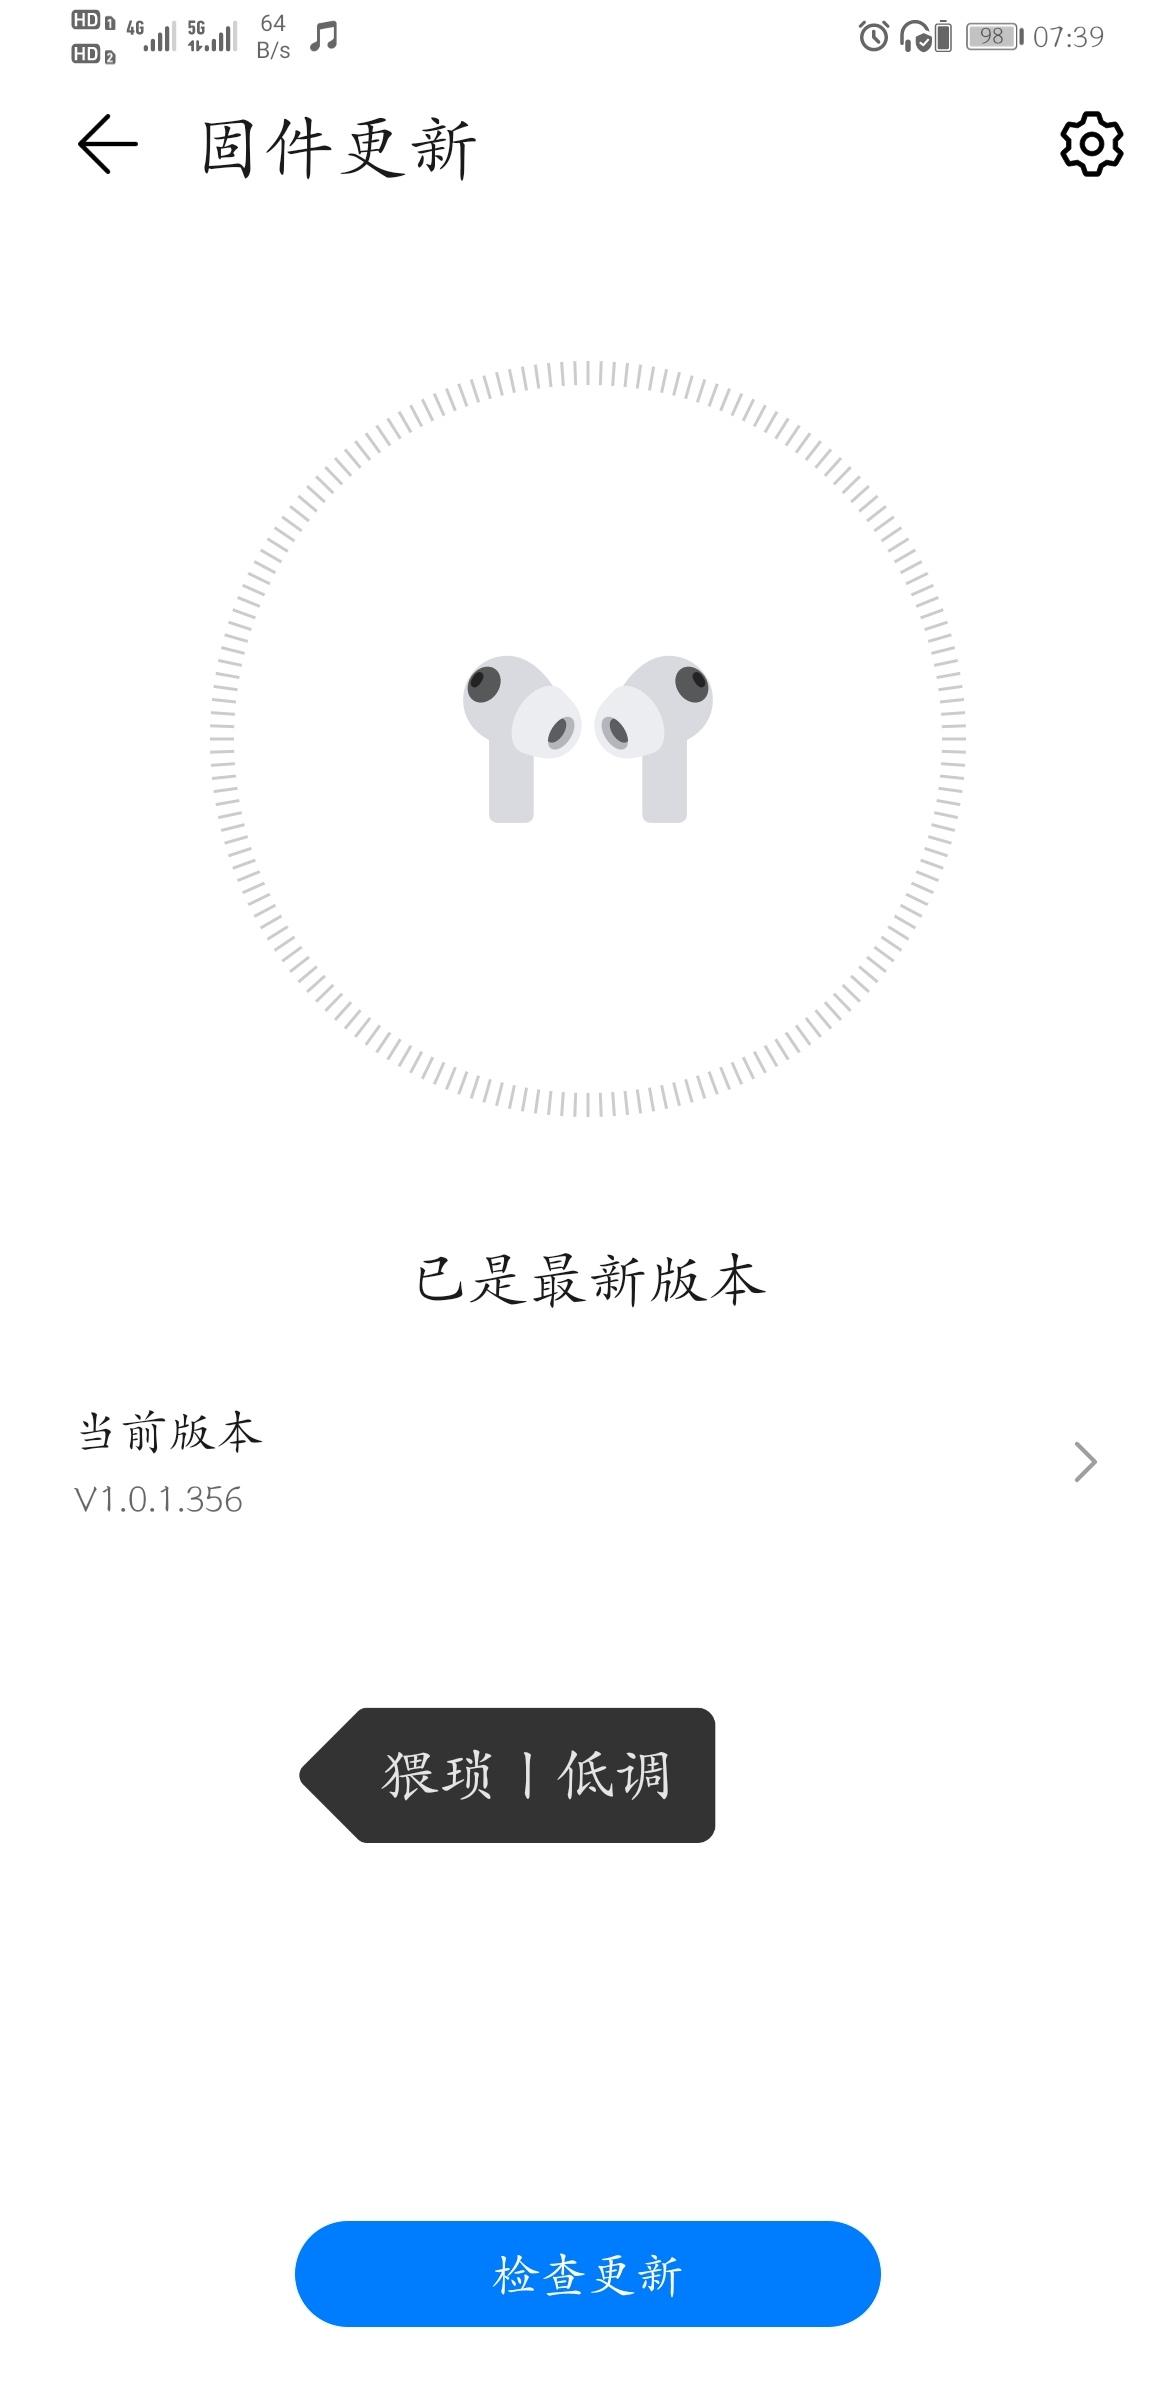 Screenshot_20210409_073953_com.huawei.smarthome_edit_33318372184498.jpg